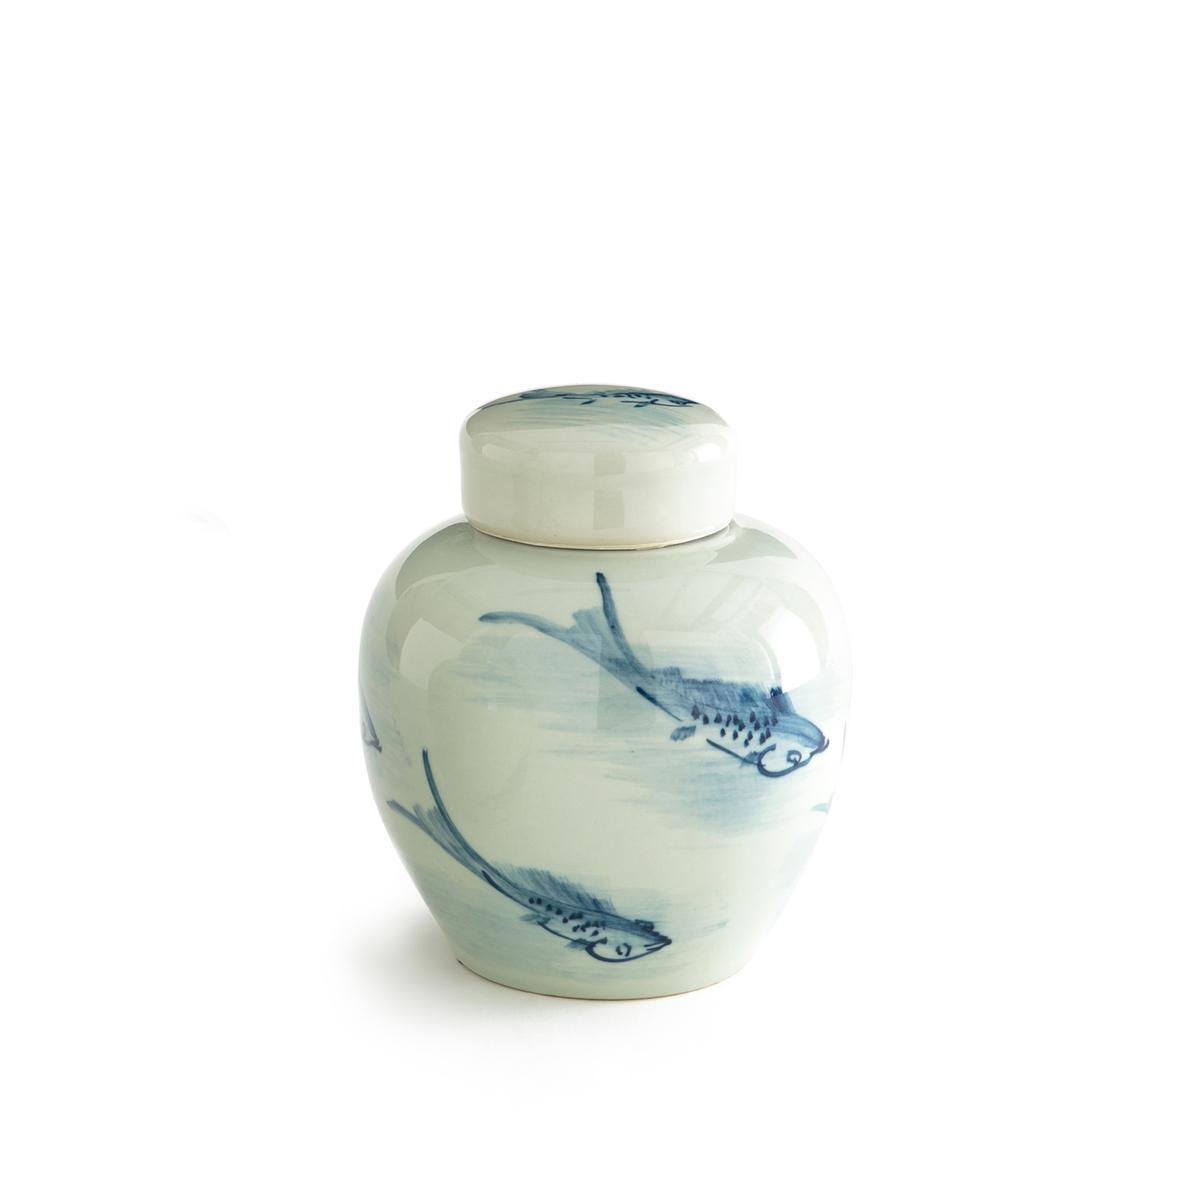 Кувшин La Redoute Из керамики Sakiro единый размер бежевый кувшин la redoute из керамики sanna единый размер каштановый